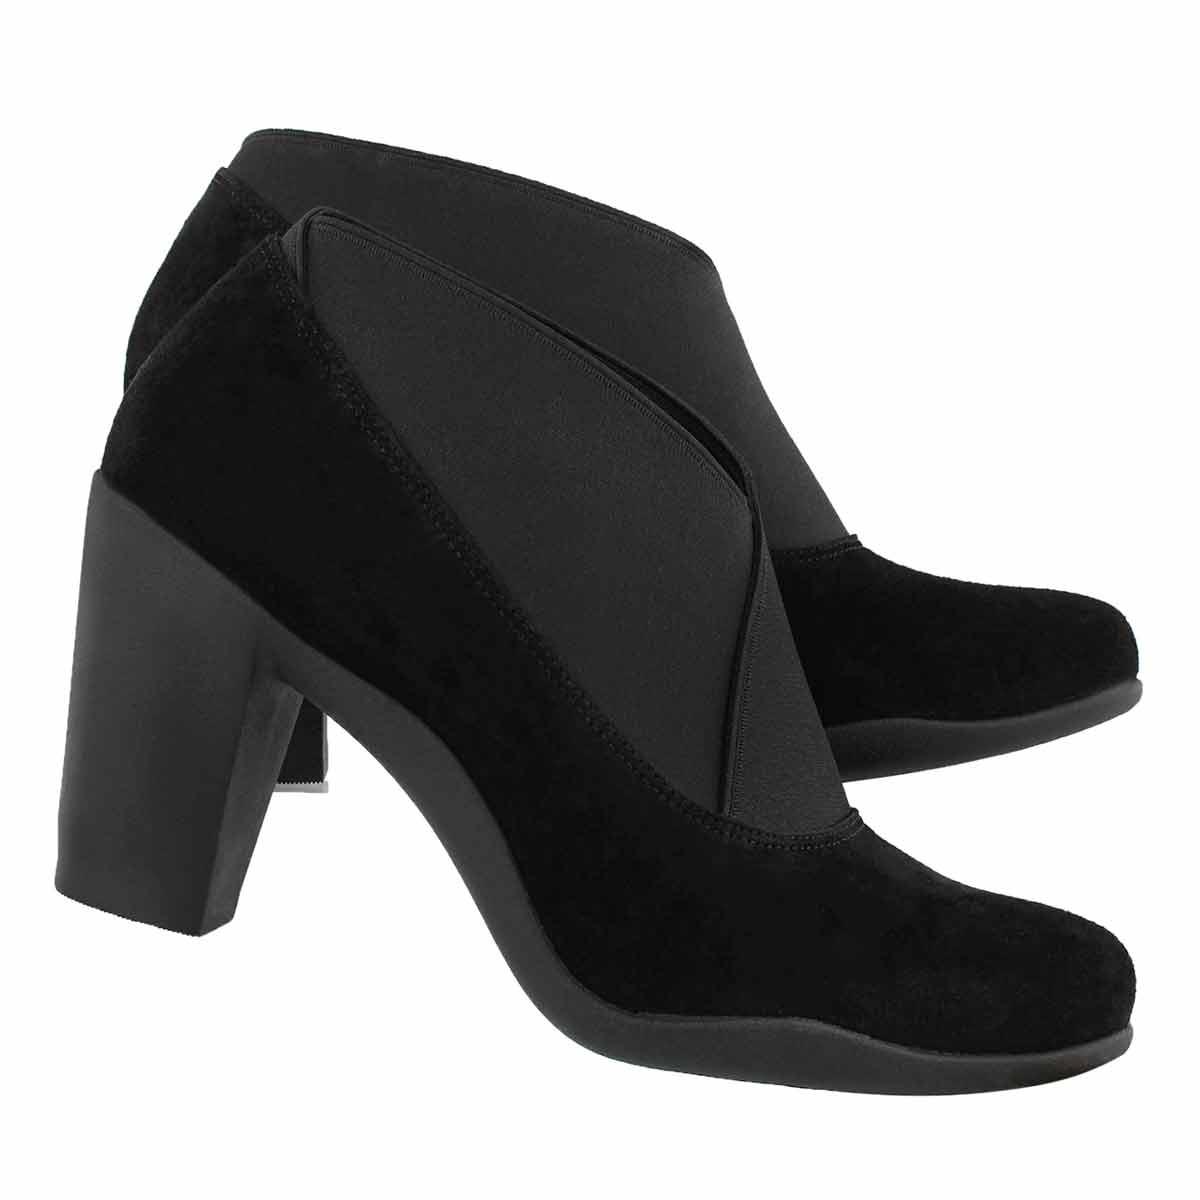 Lds Adya Luna blk dress heel